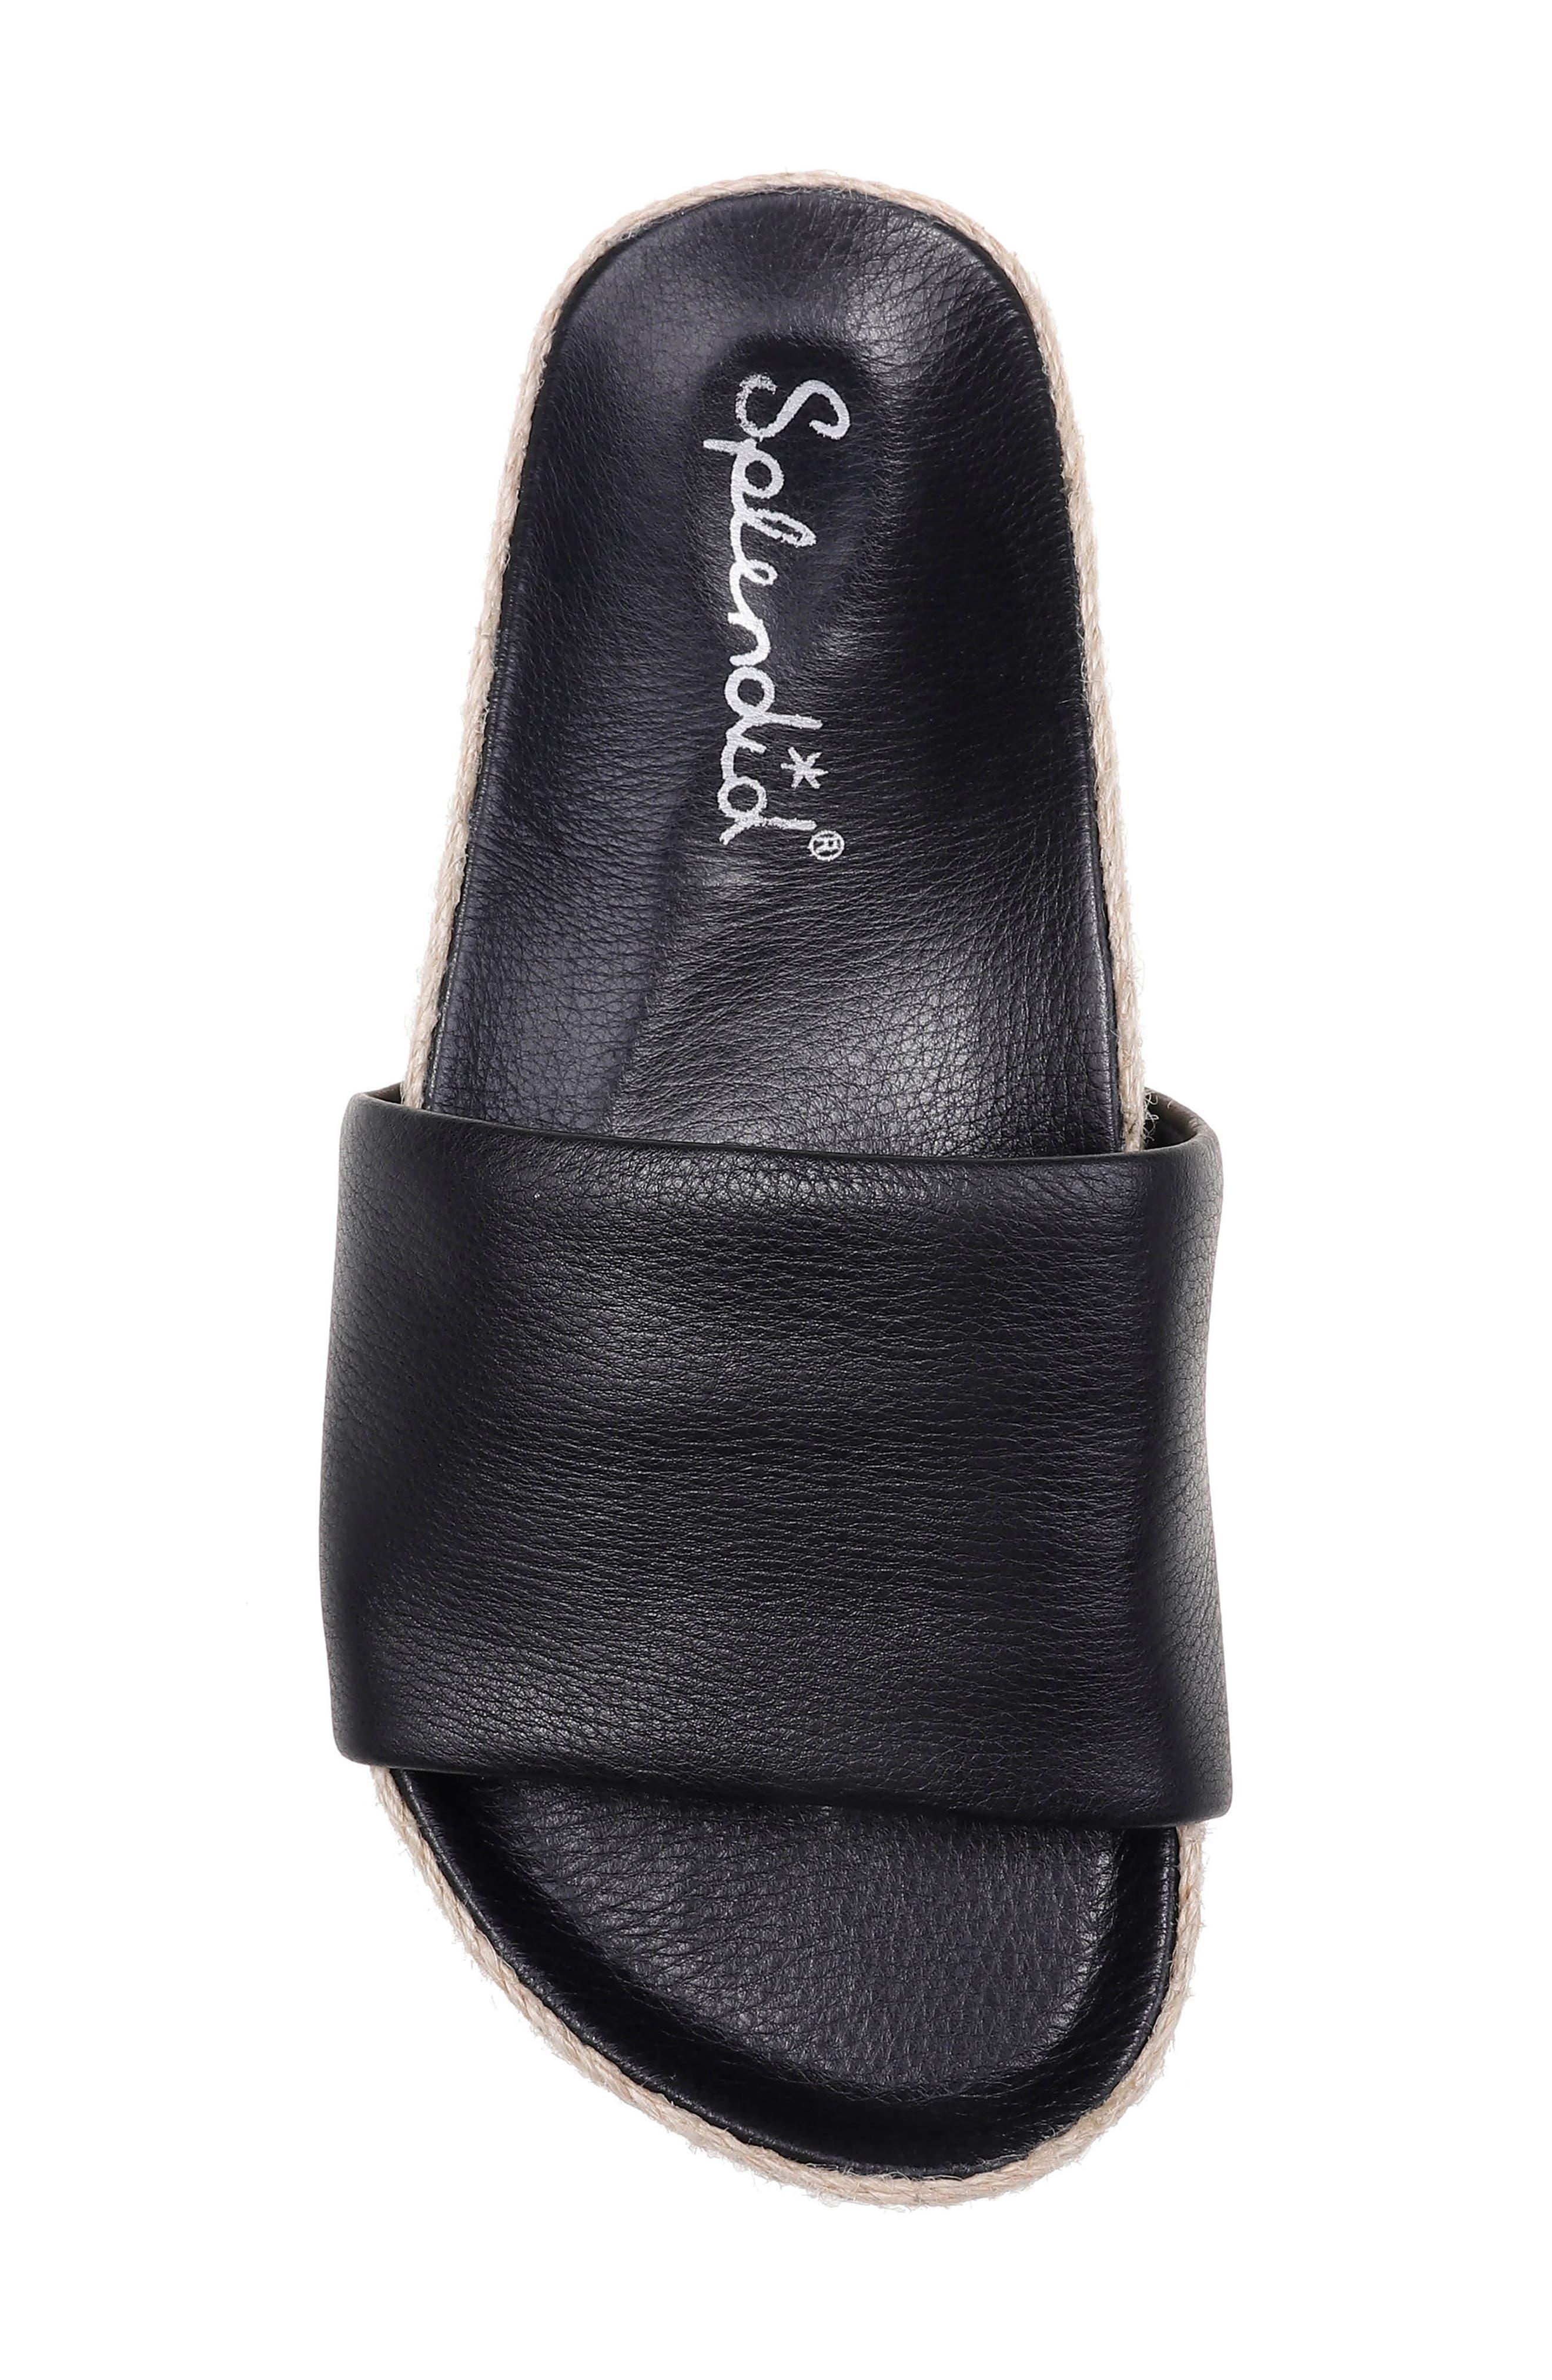 SPLENDID, Sandford Espadrille Slide Sandal, Alternate thumbnail 5, color, BLACK LEATHER